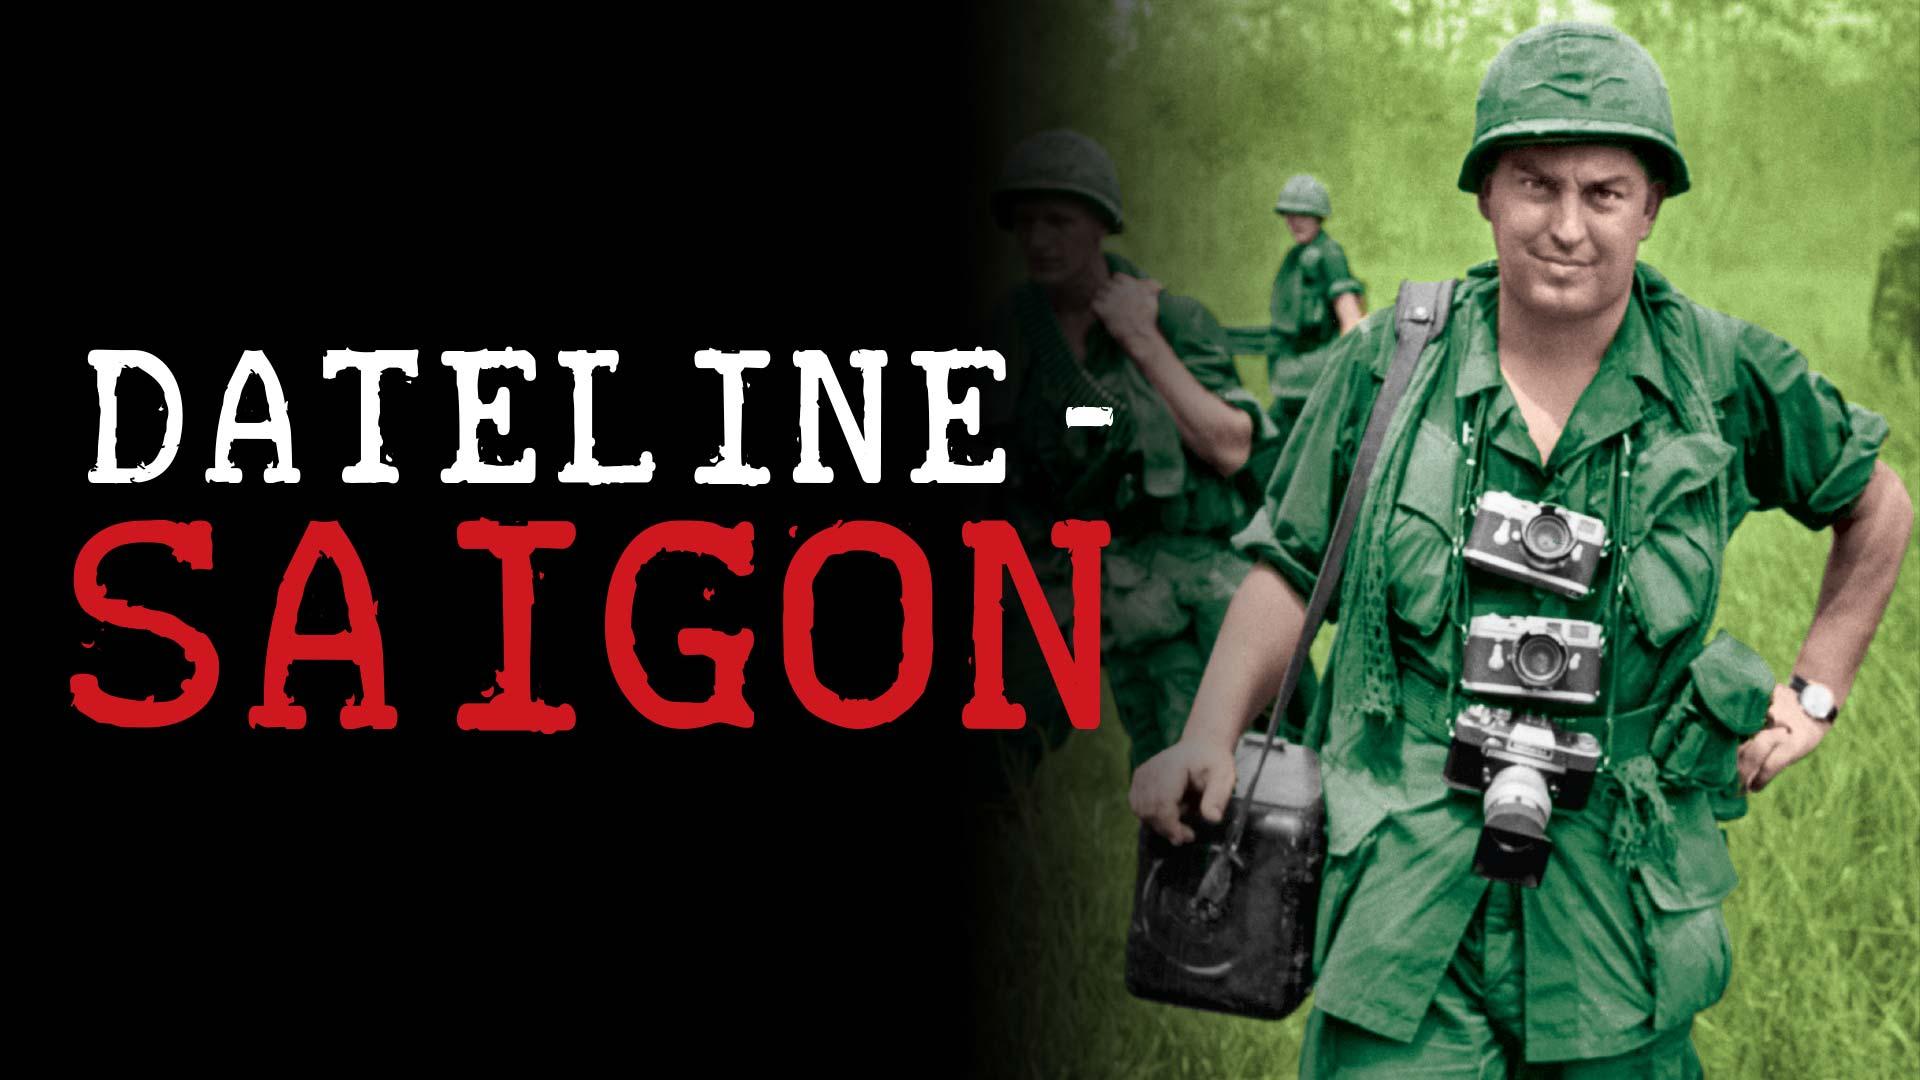 Dateline - Saigon - image